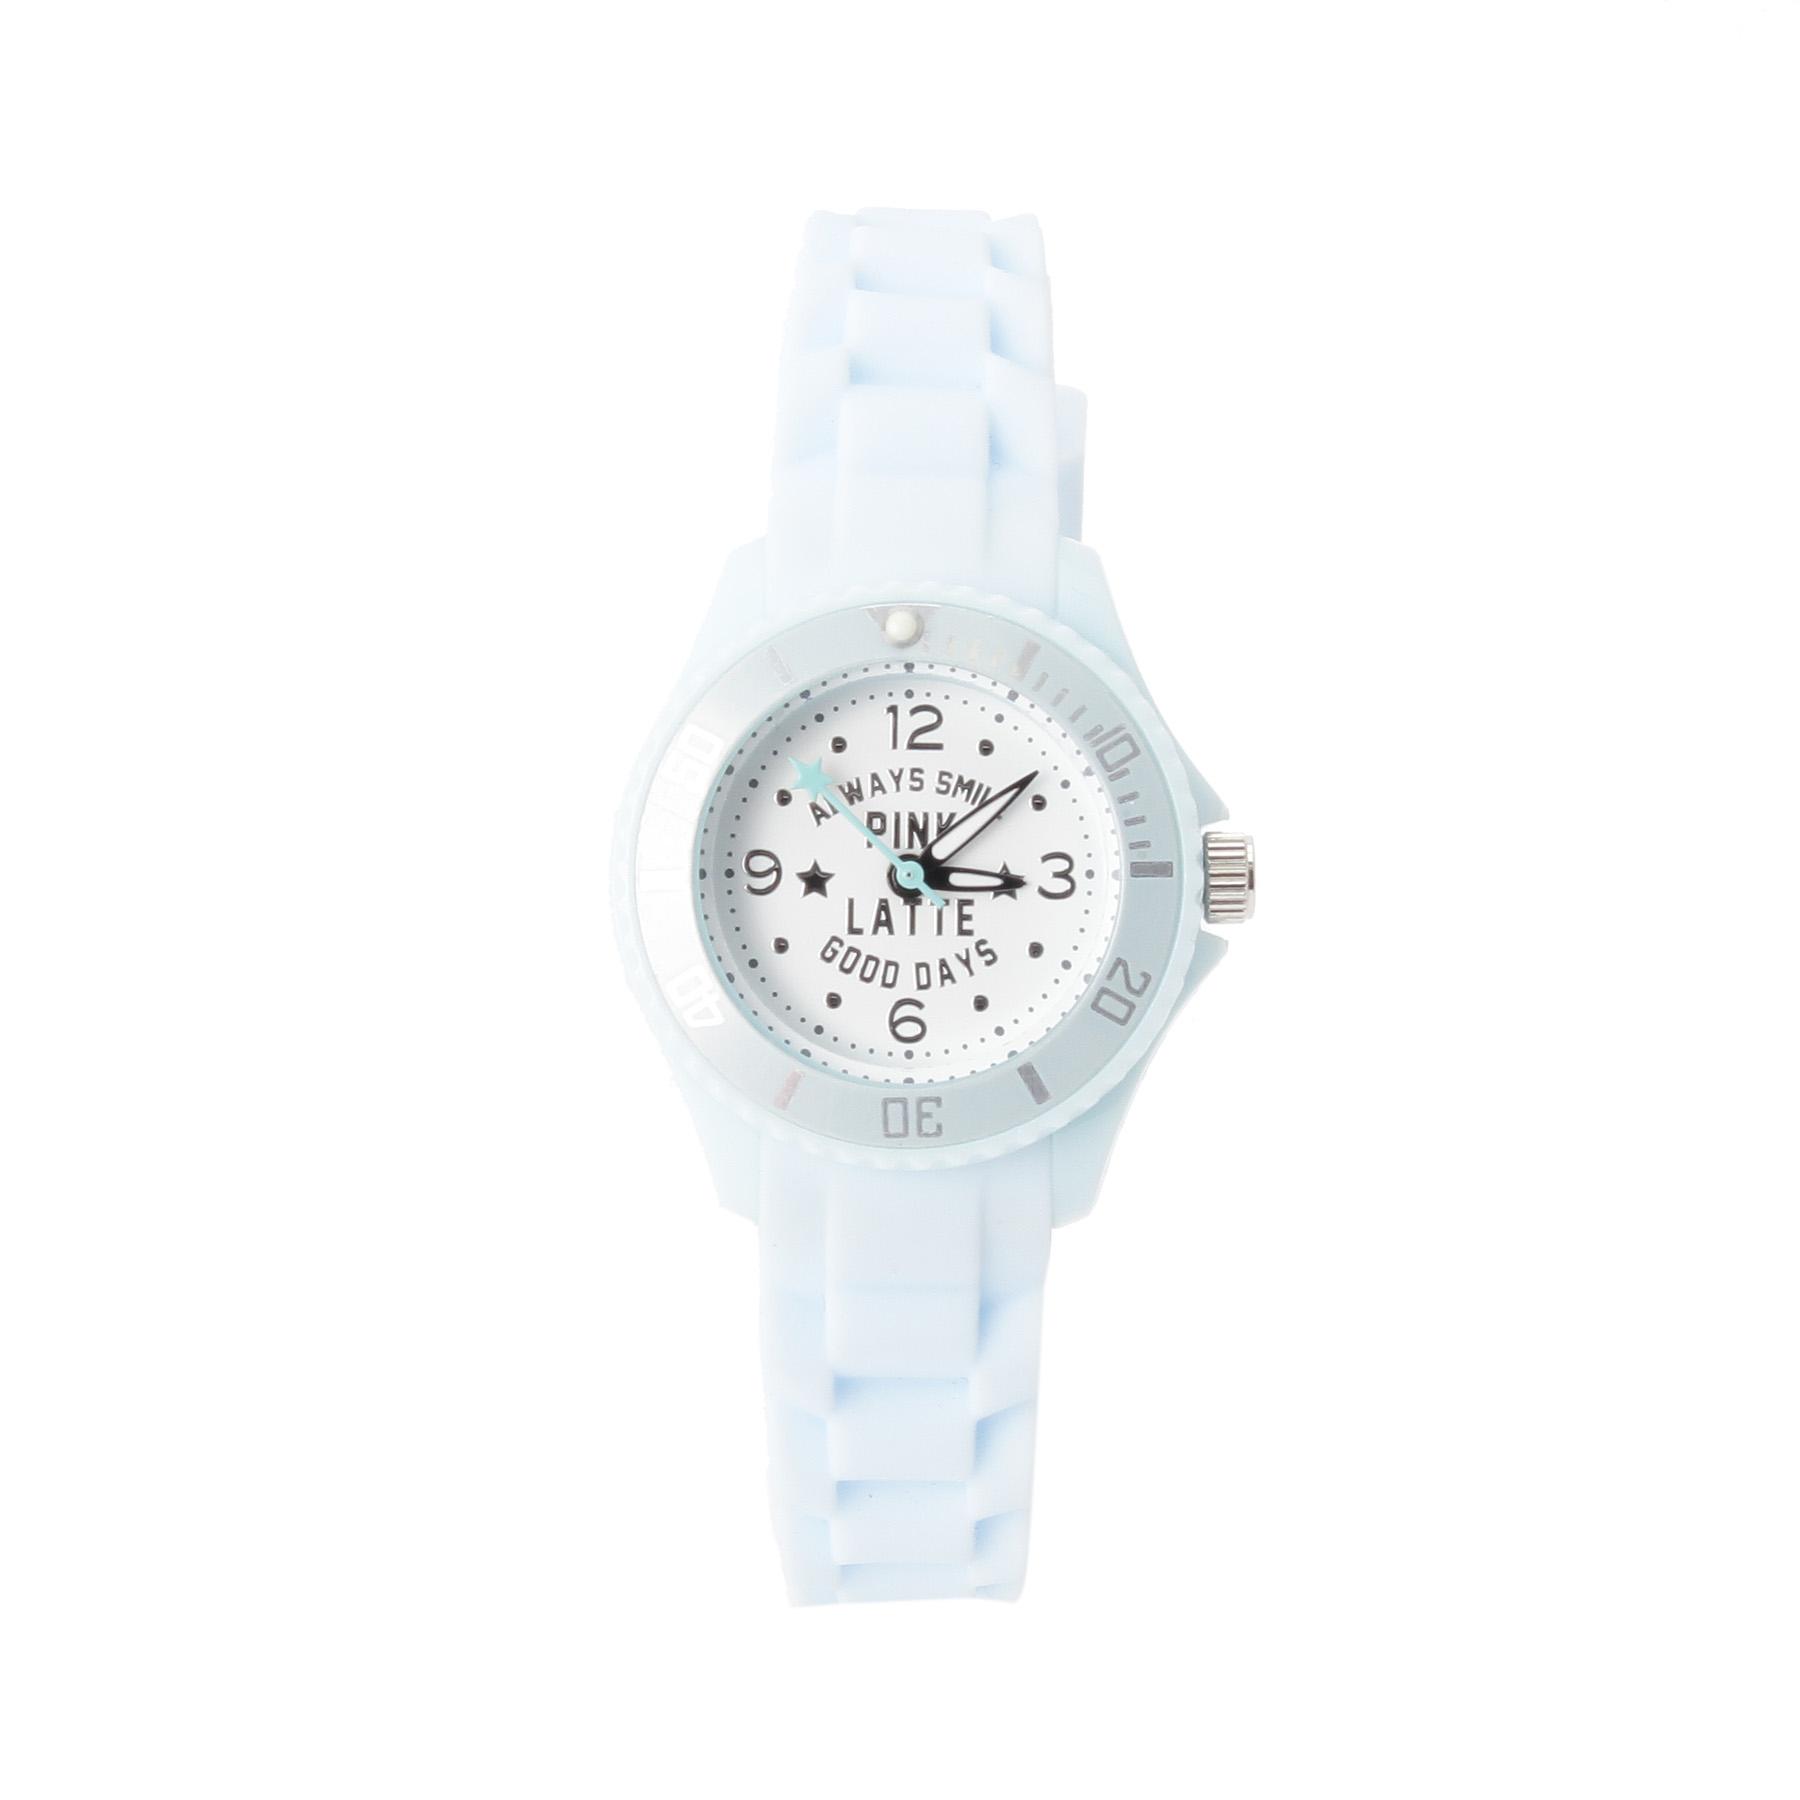 【PINK-latte (ピンク ラテ)】ラバーウォッチ(スター)ティーンズ 雑貨 腕時計 サックス